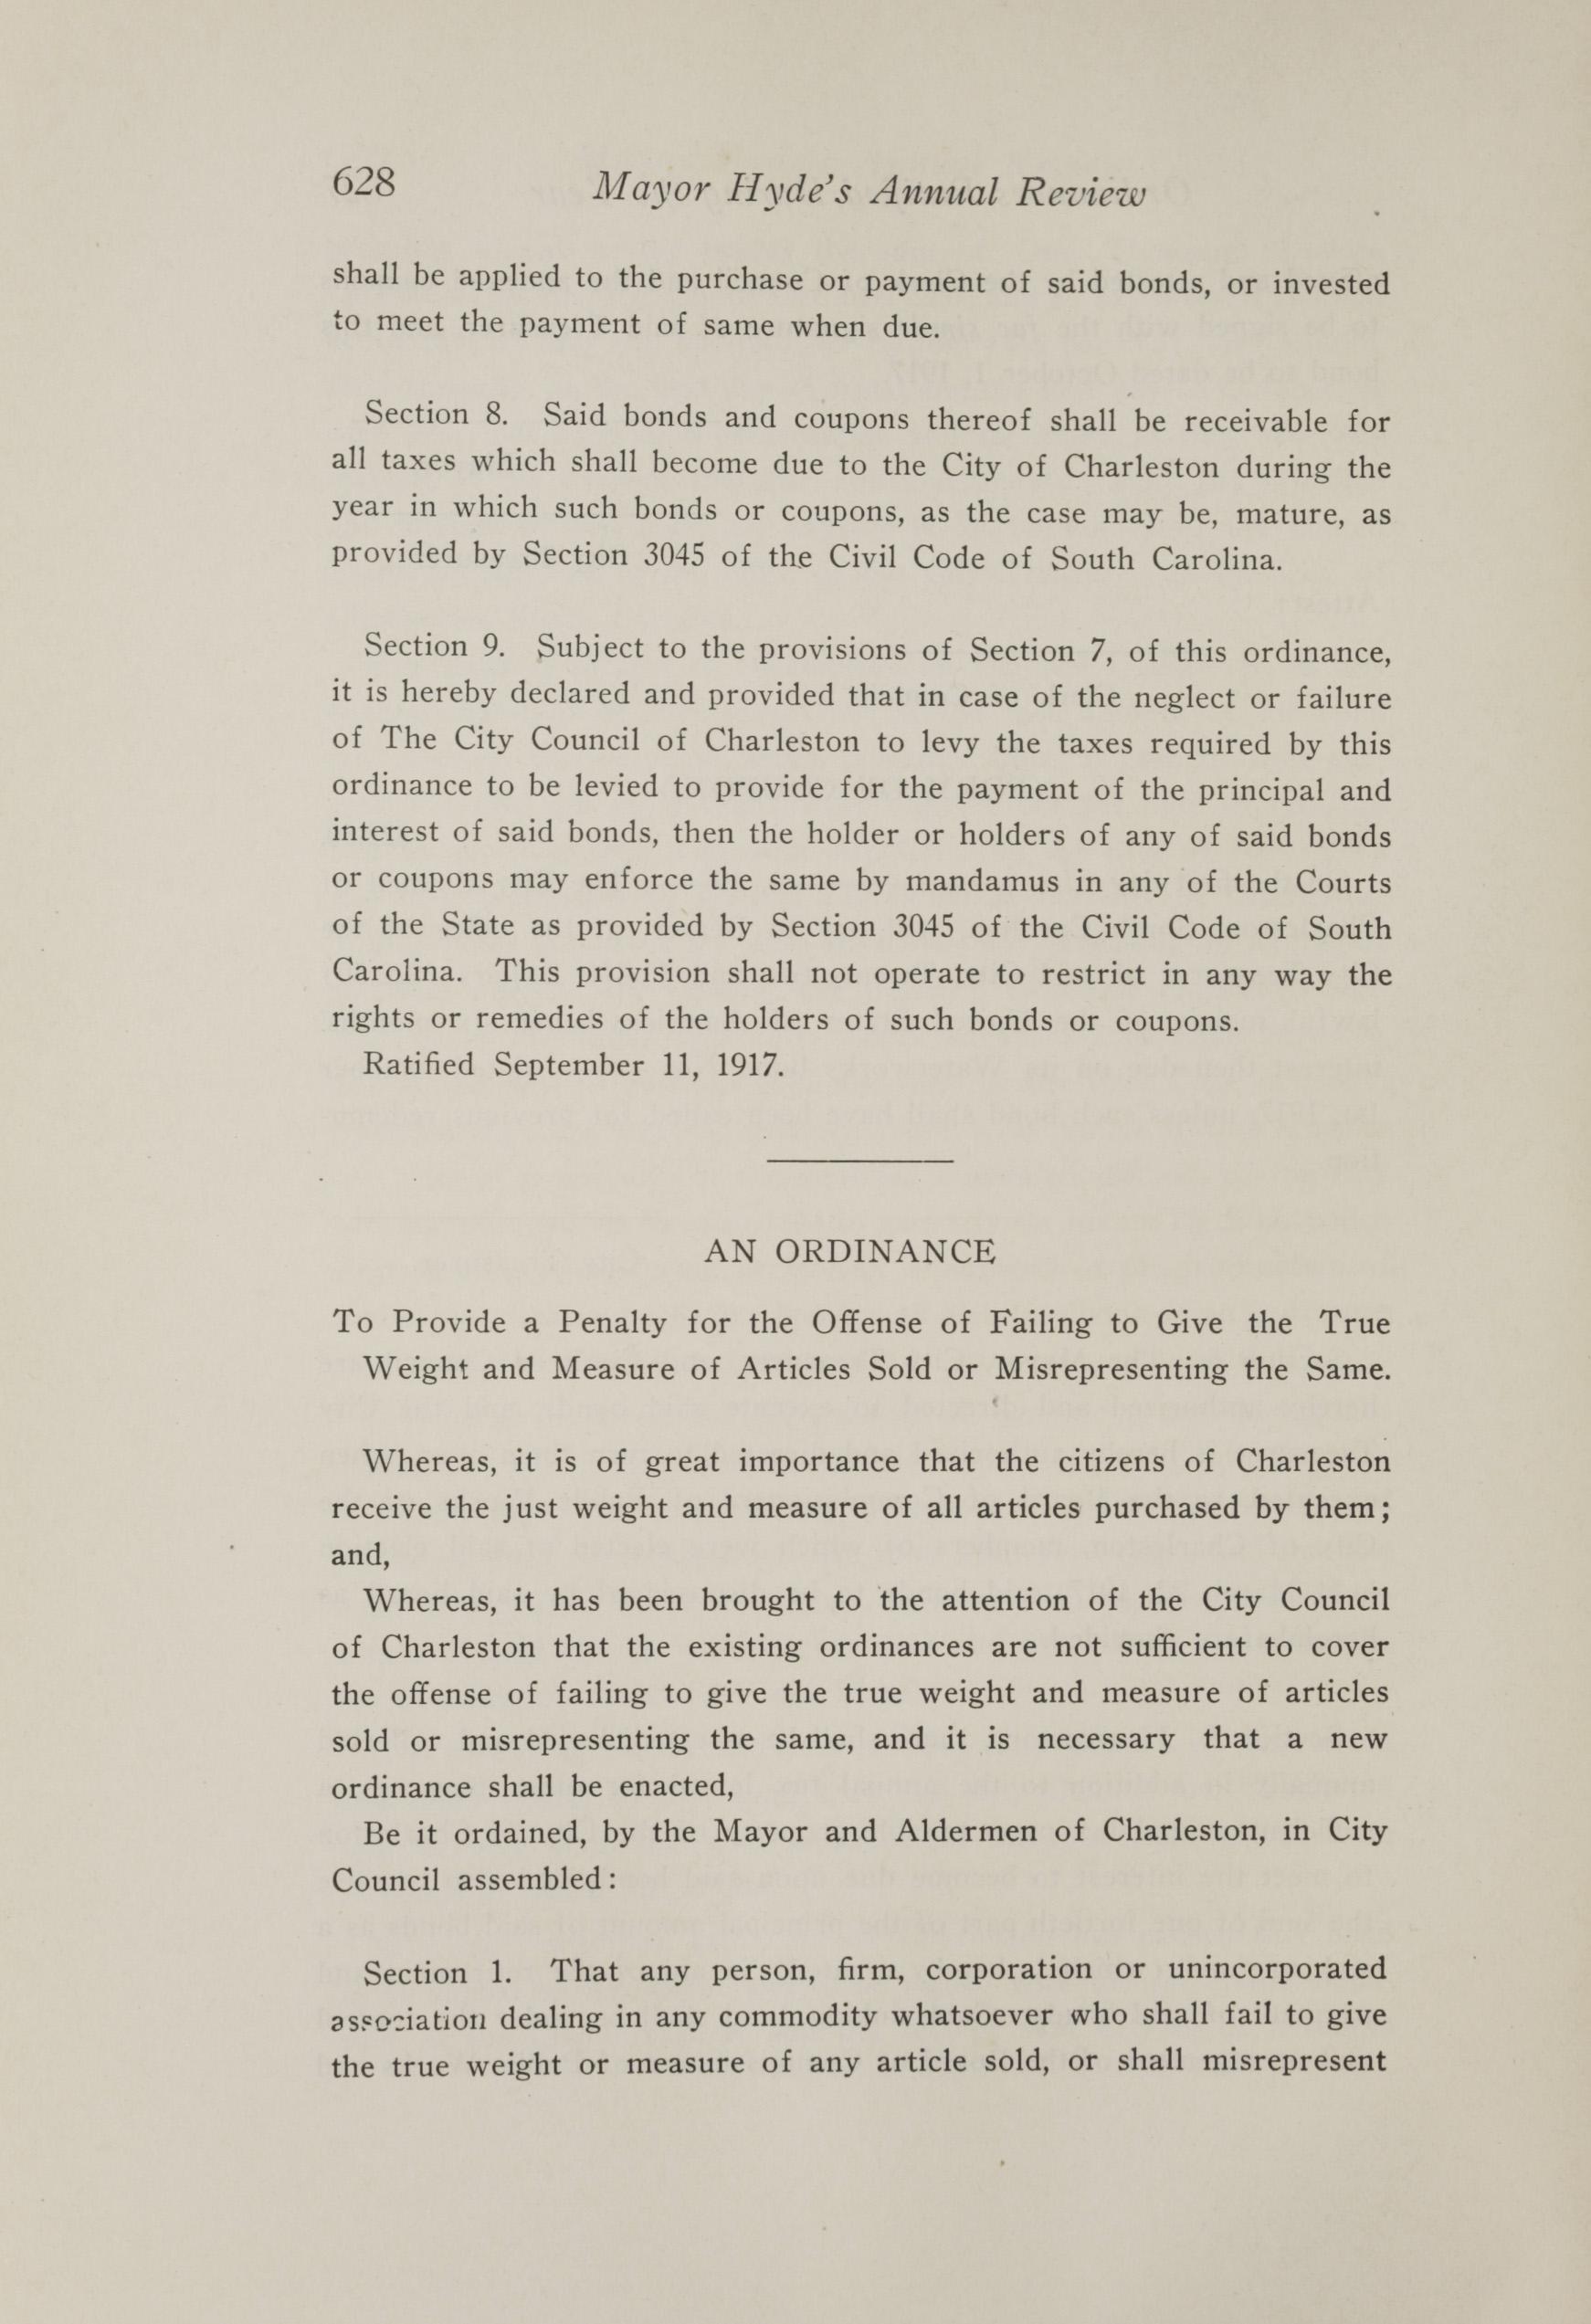 Charleston Yearbook, 1917, page 628